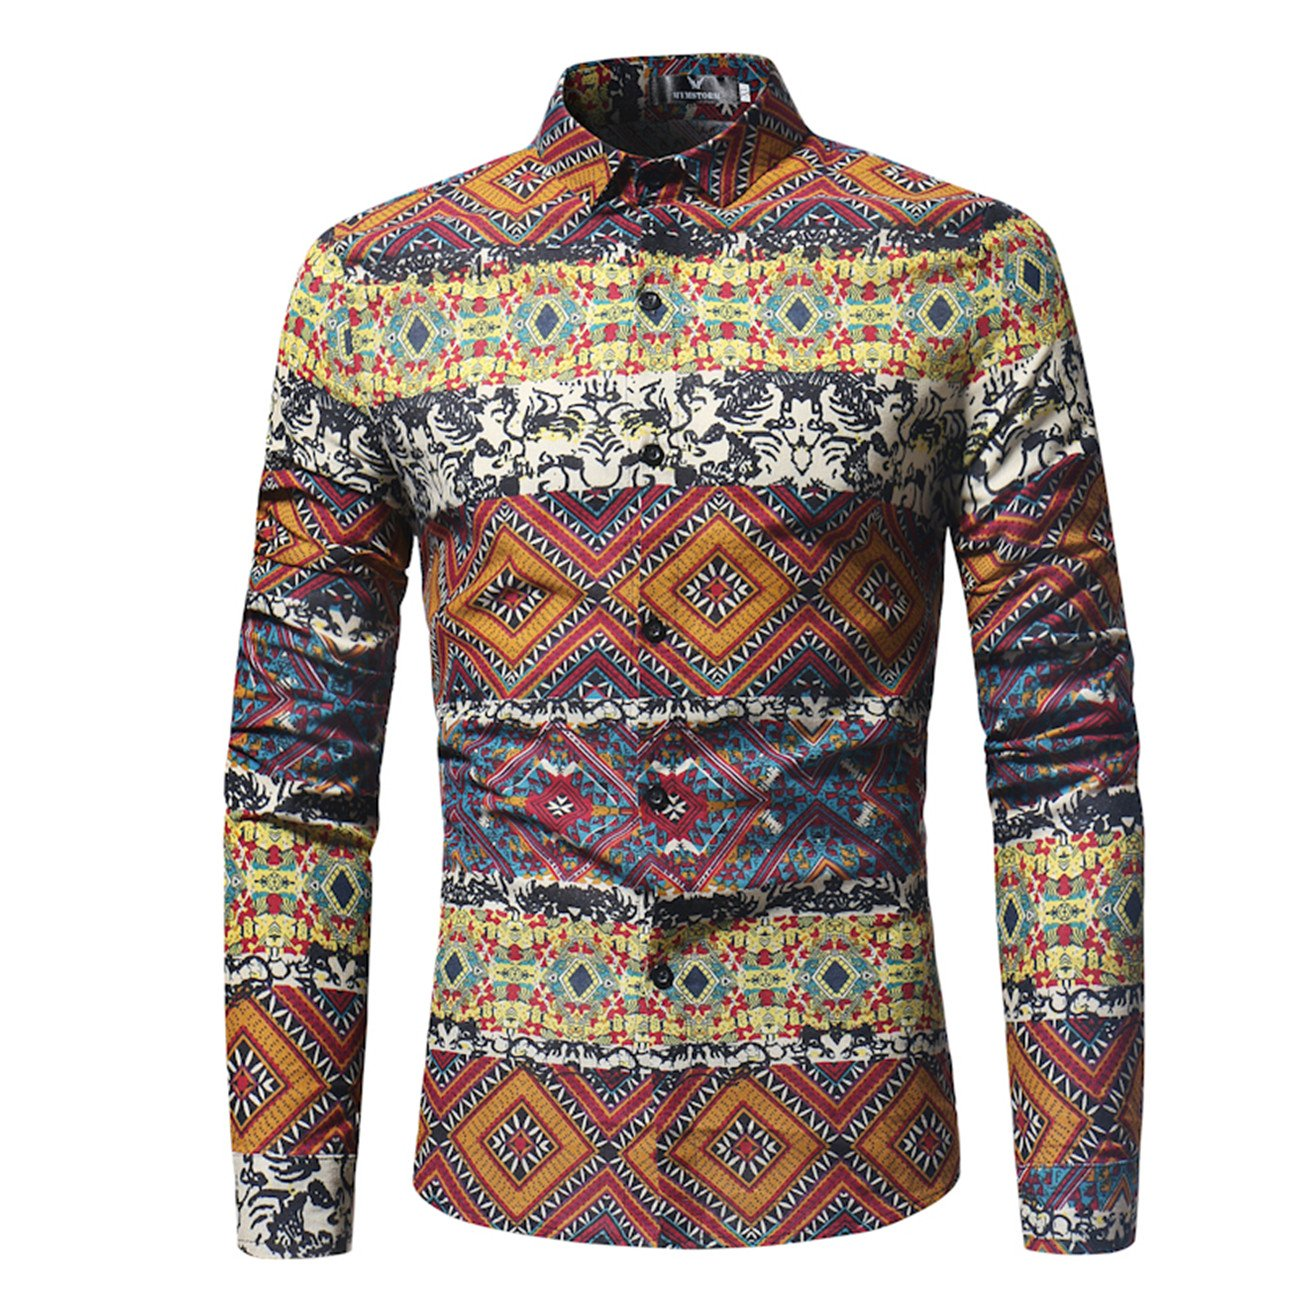 Mens Printed Casual Fashion Long-Sleeved Button Down Shirt